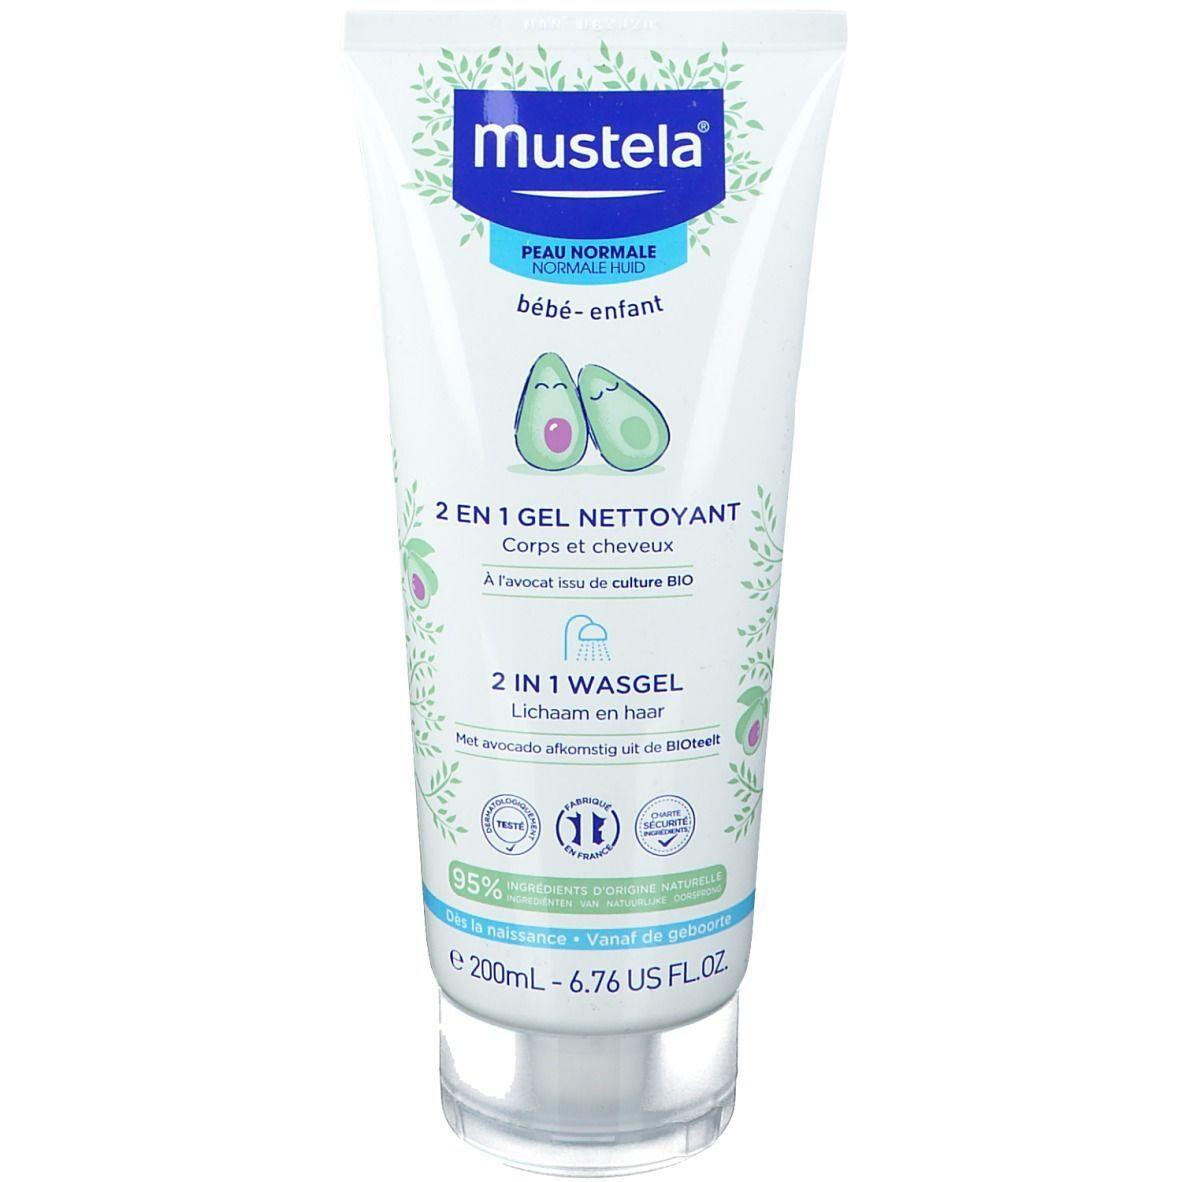 mustela® Bébé Enfant Gel Nettoyant 2 en 1 Peau Normale ml gel nettoyant